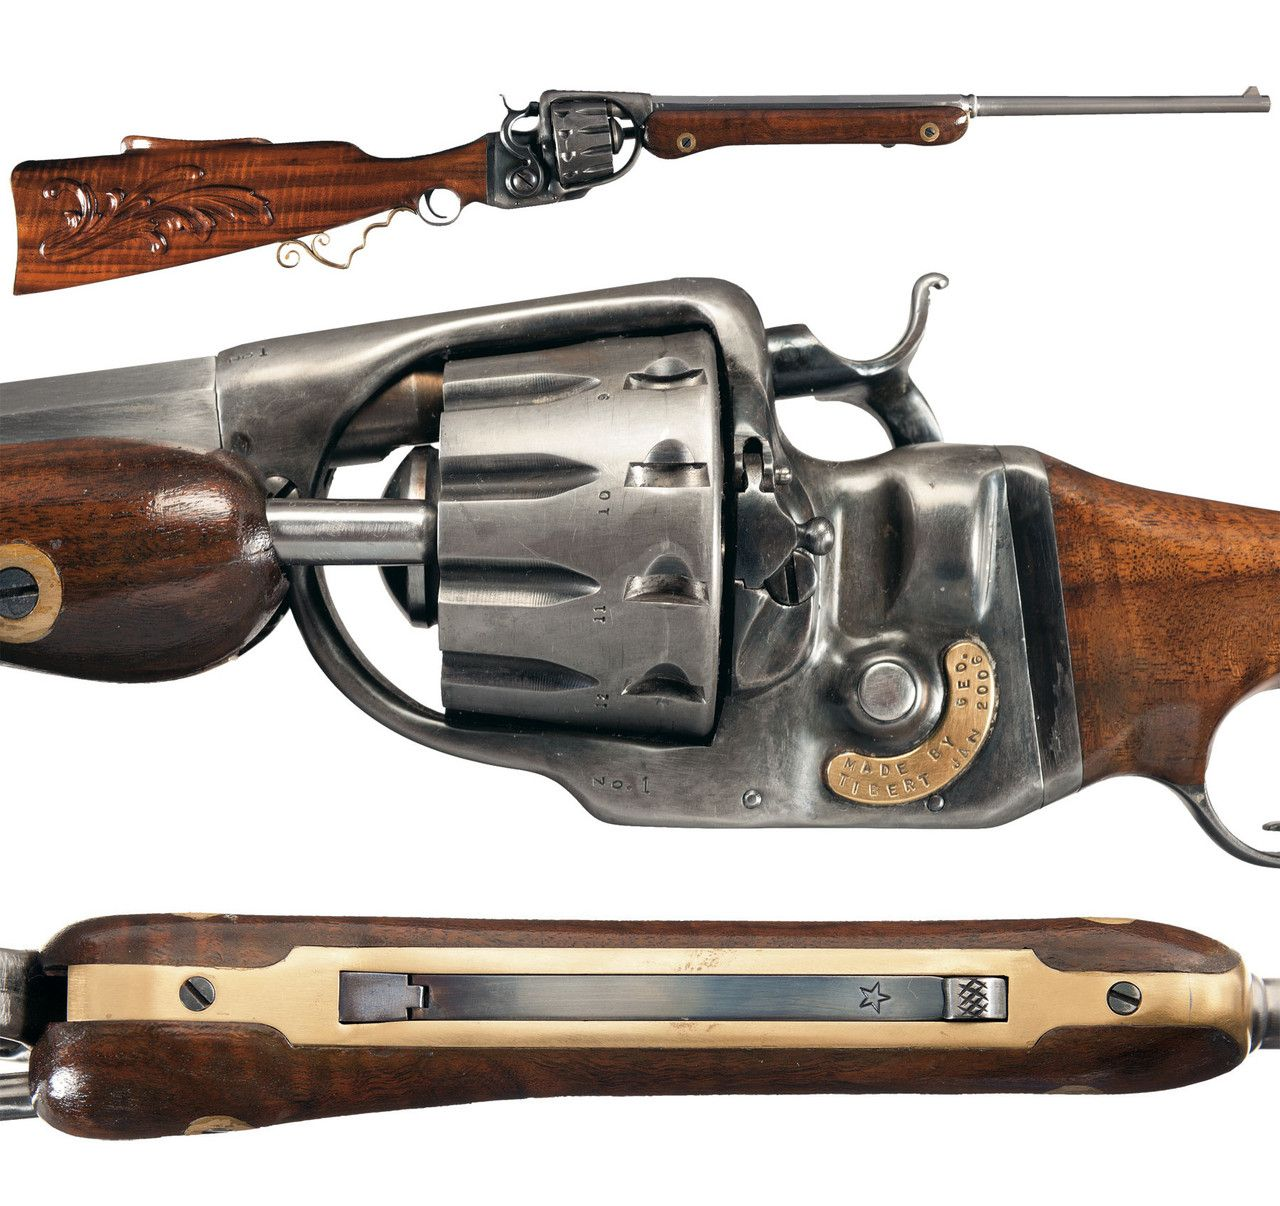 Double pistol handgun revolver gun display case cabinet rack shadowbox - Revolver Rifle Google Search Weapon Guns Pinterest Revolvers Weapons And Guns